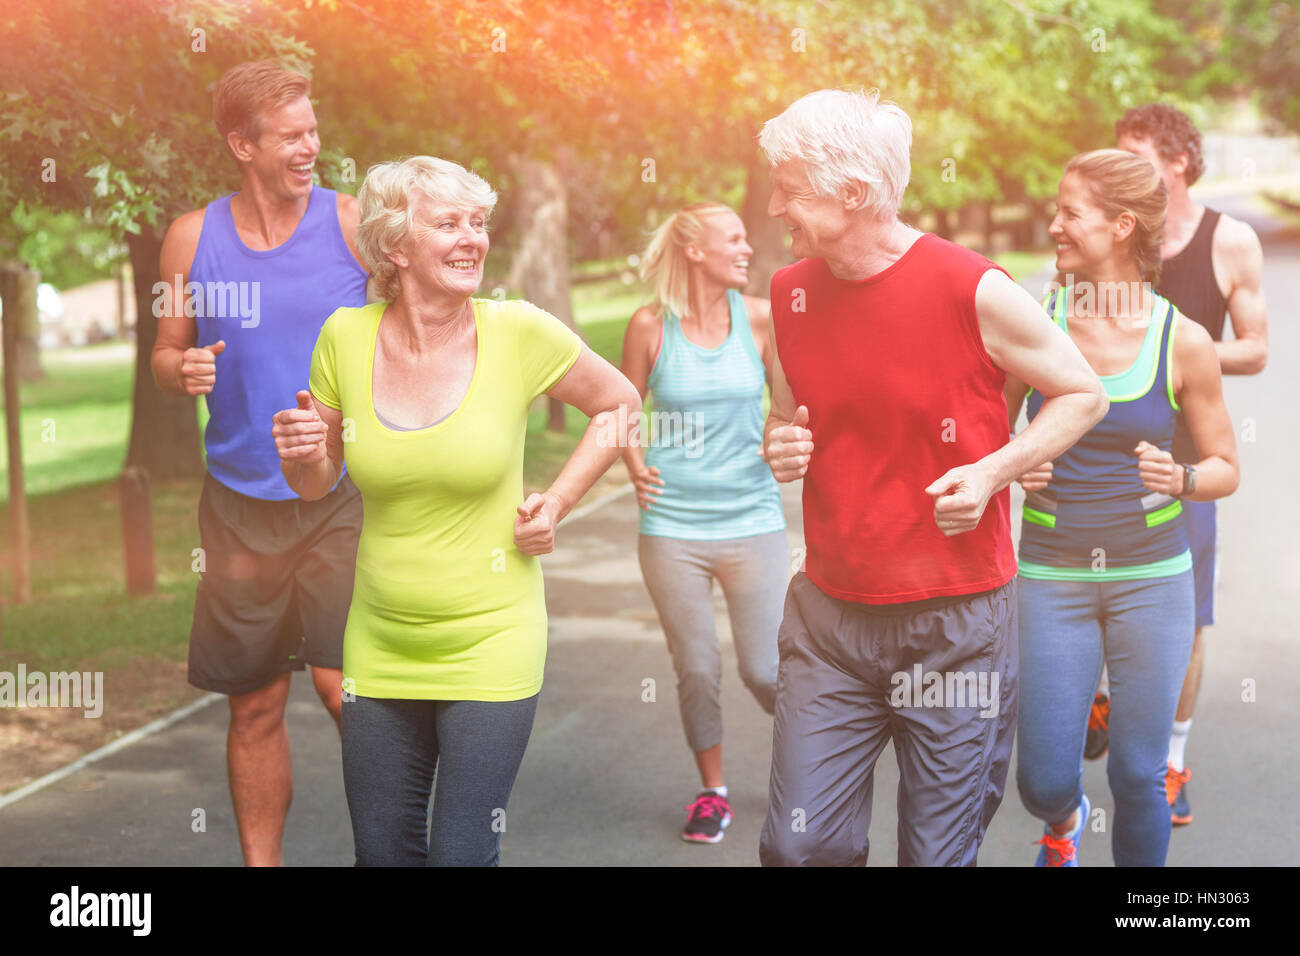 Marathon athletes running in park - Stock Image